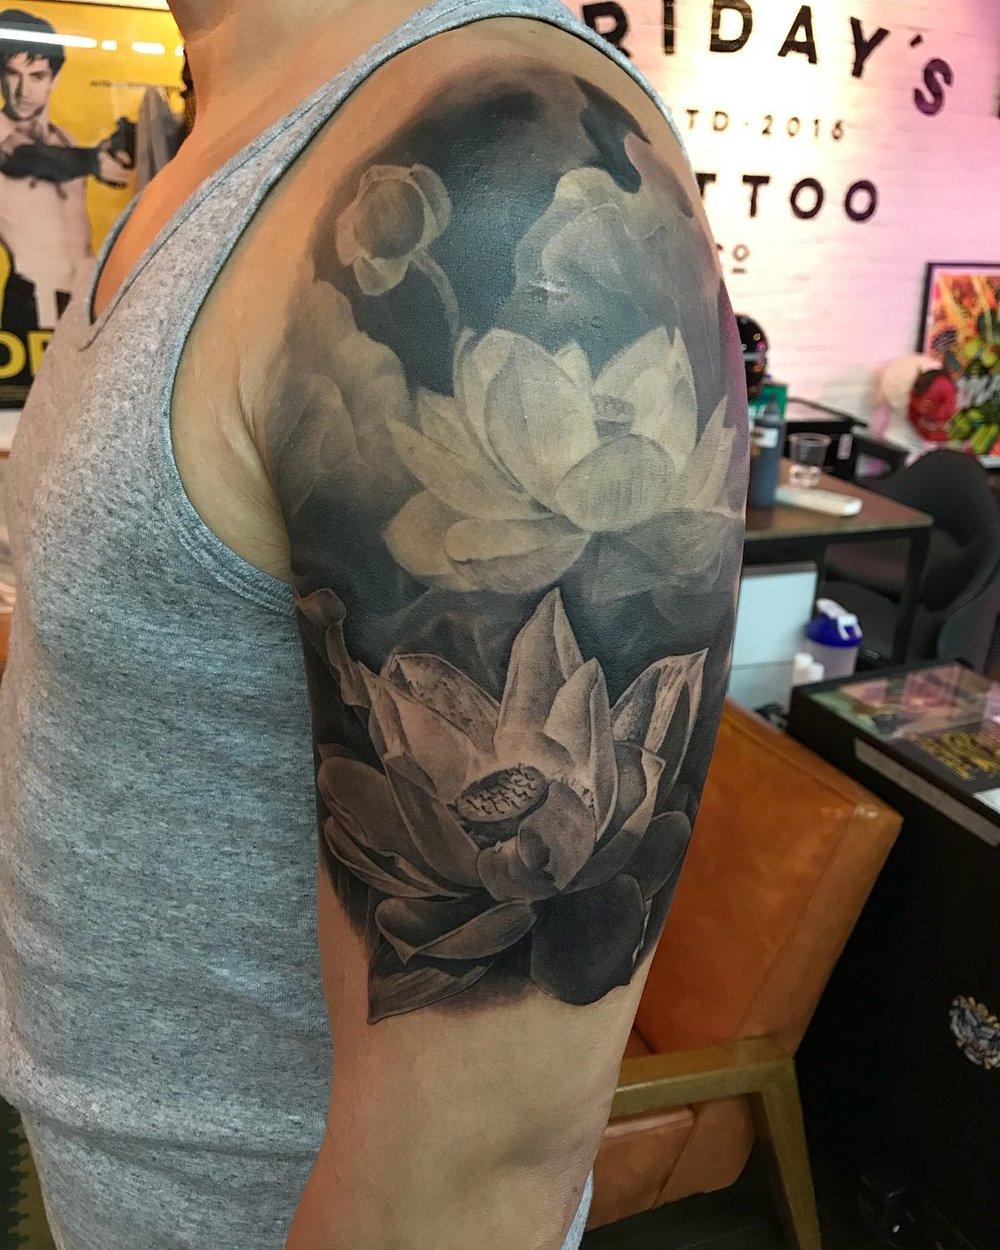 2018-fridays-tattoo-hong-kong-jamie-graphic-realistic-lotus-3.jpg